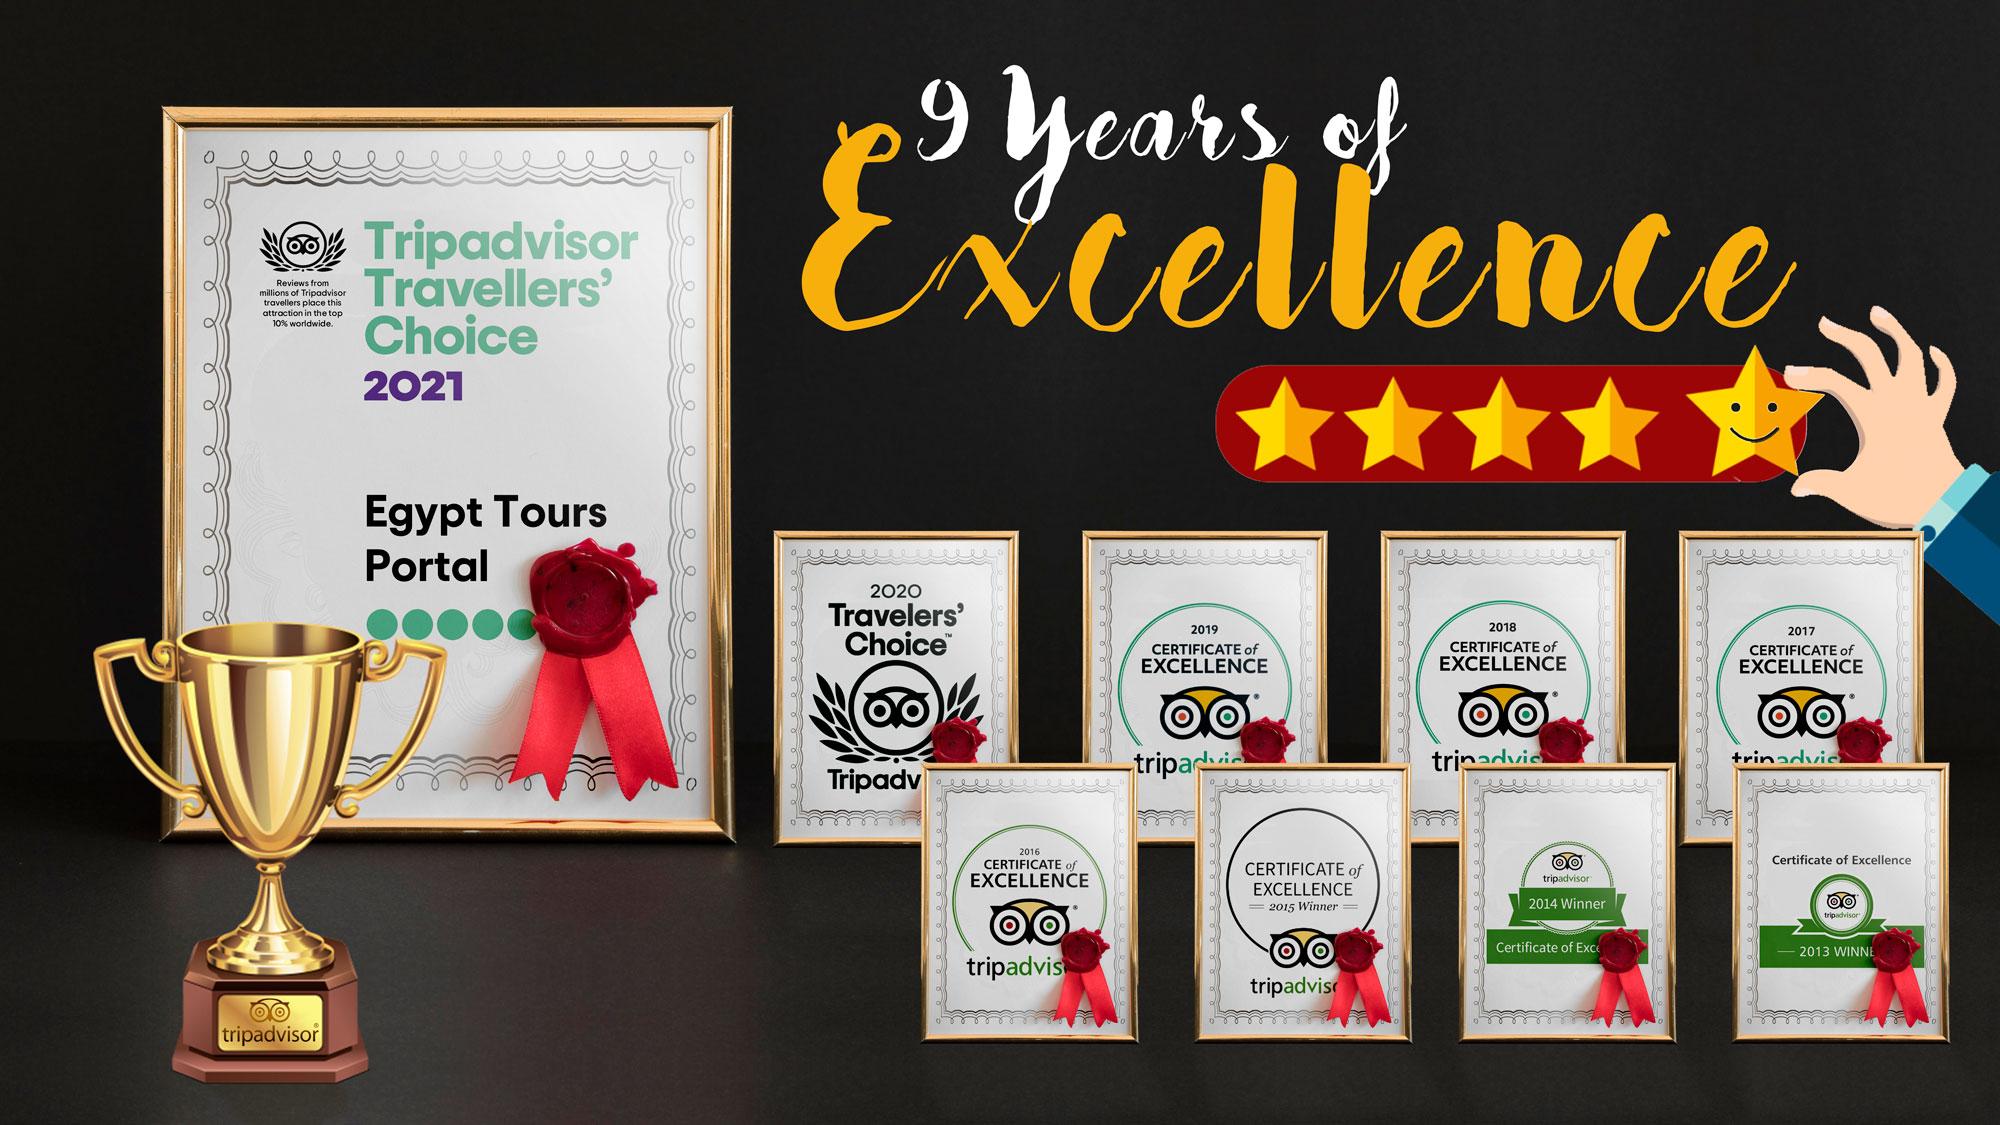 9 Years of Winning TripAdvisor Traveler Choice - Egypt Tours Portal